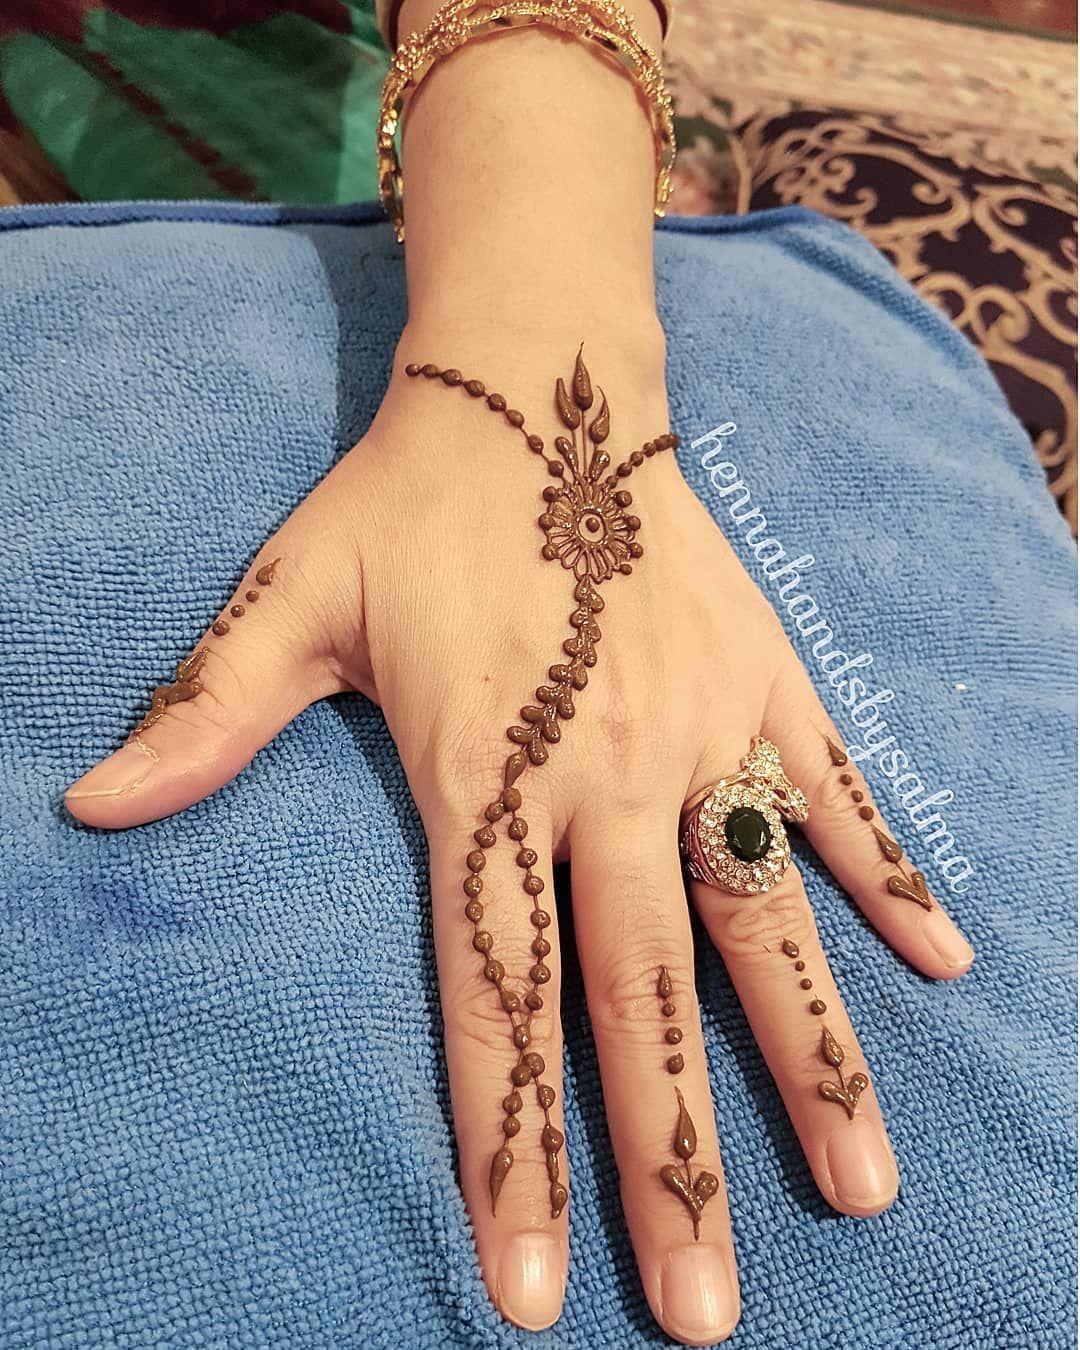 Simple henna design hennahandsbysalma hennahands hennalookbook